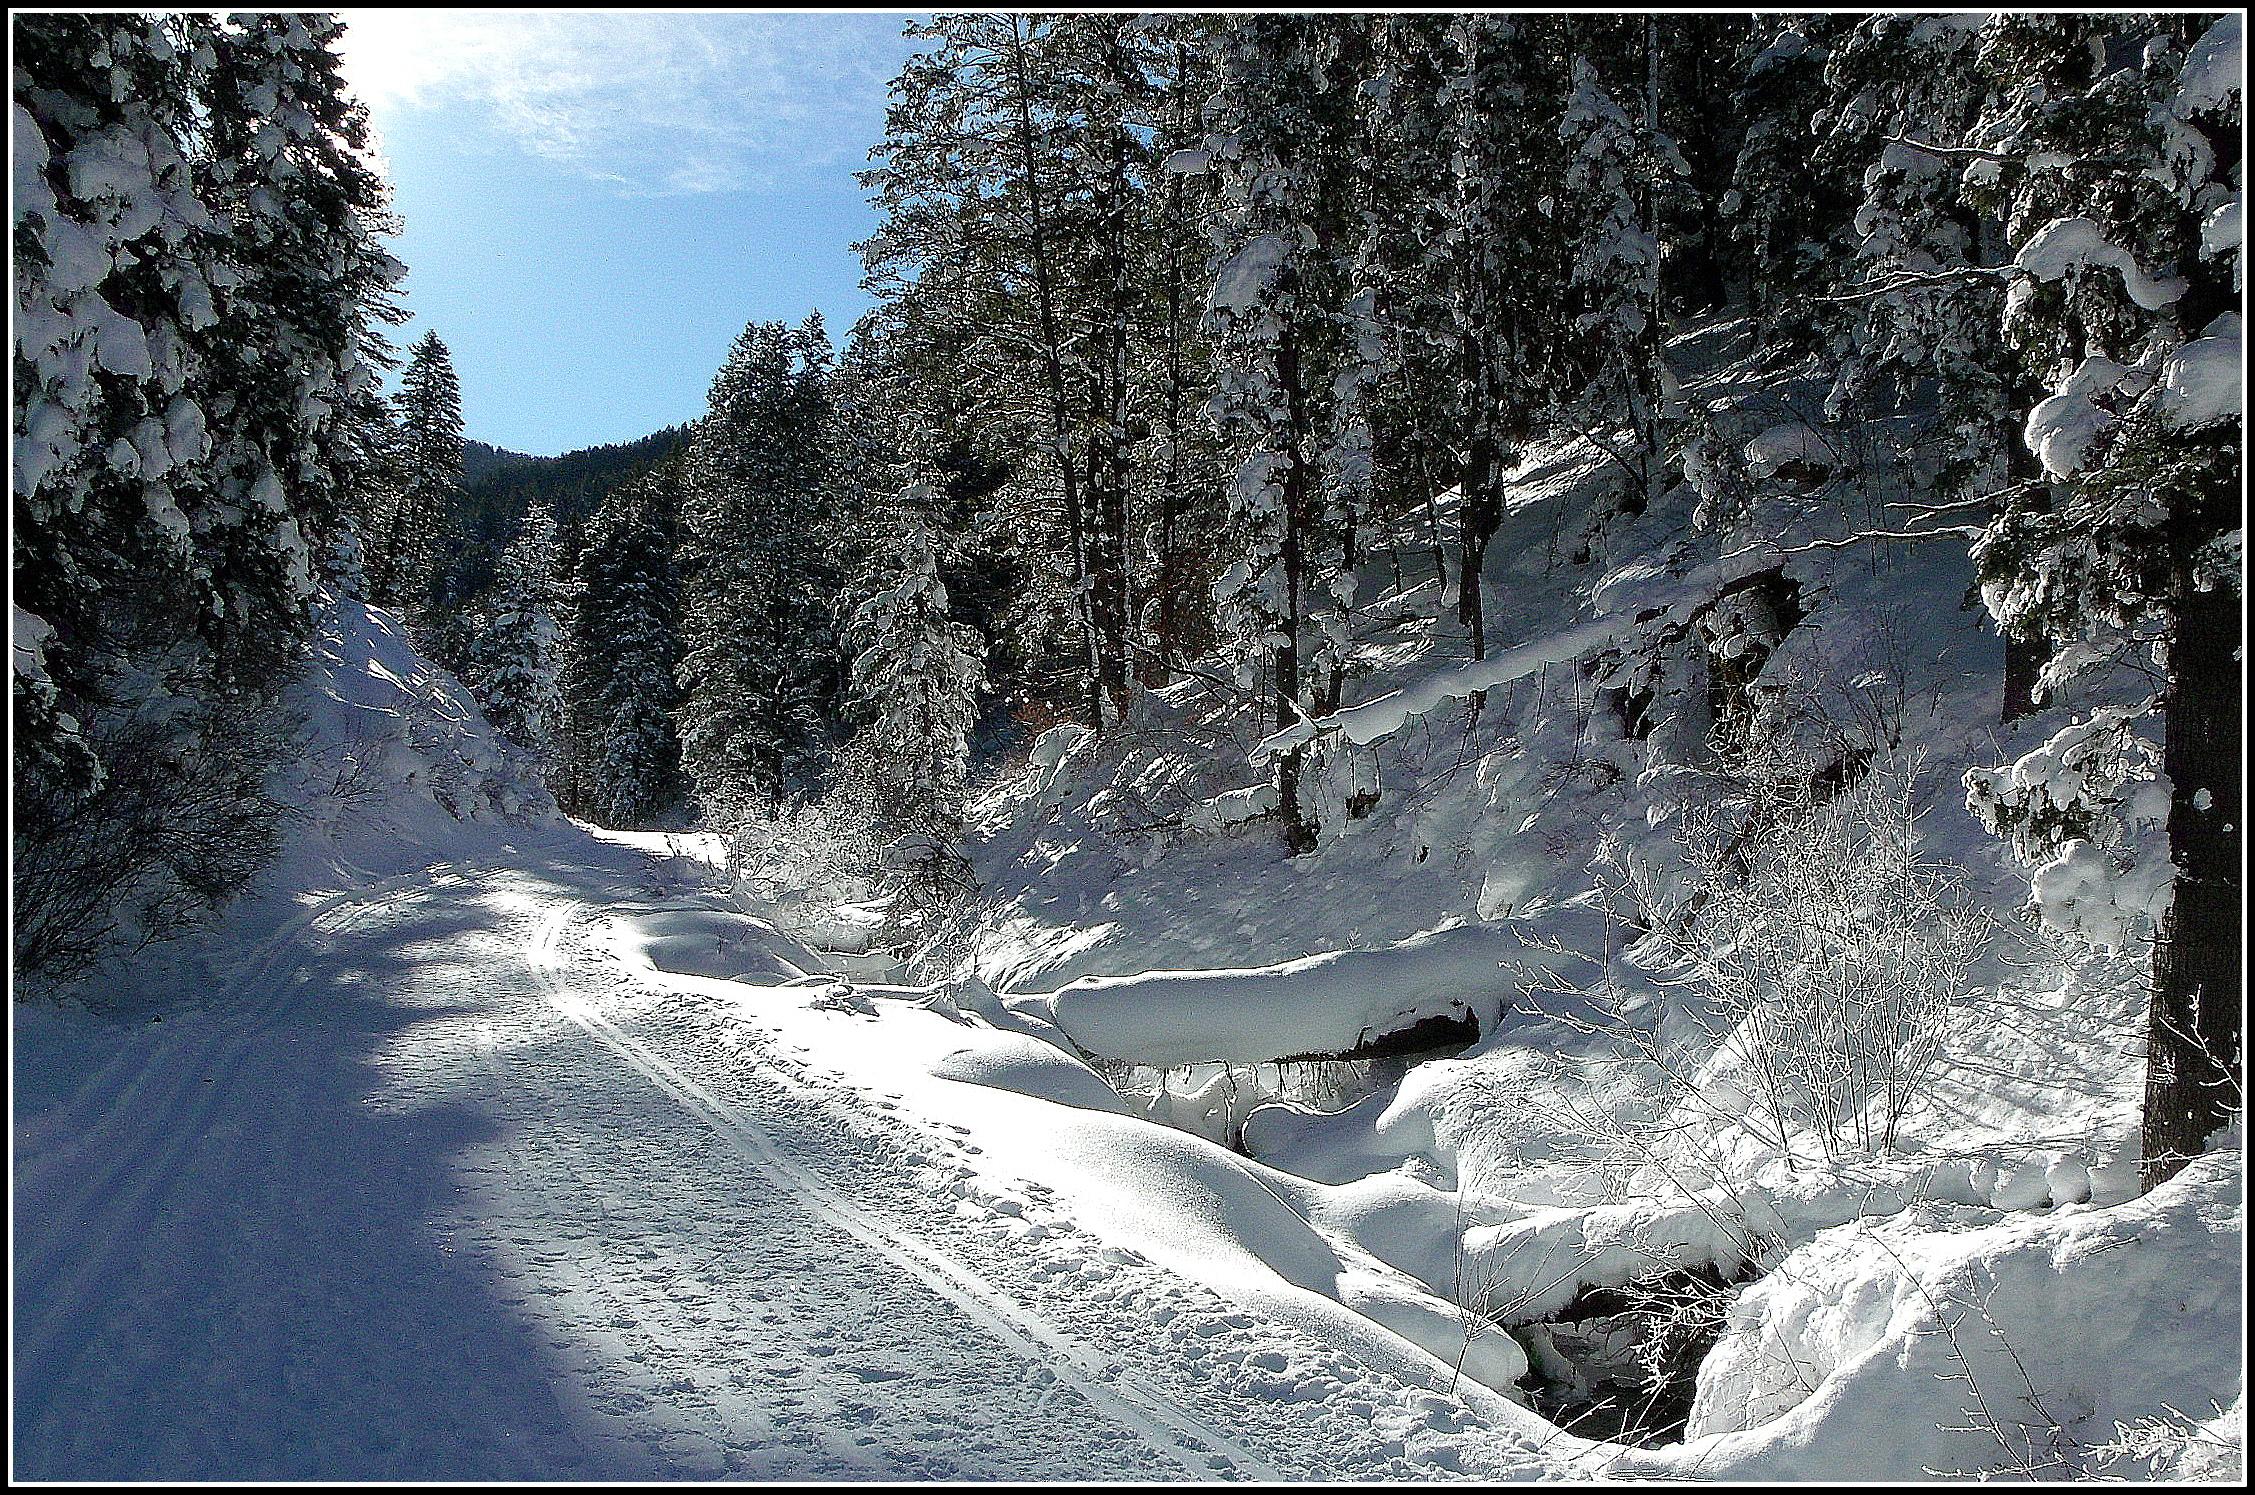 Millcreek Winter in color